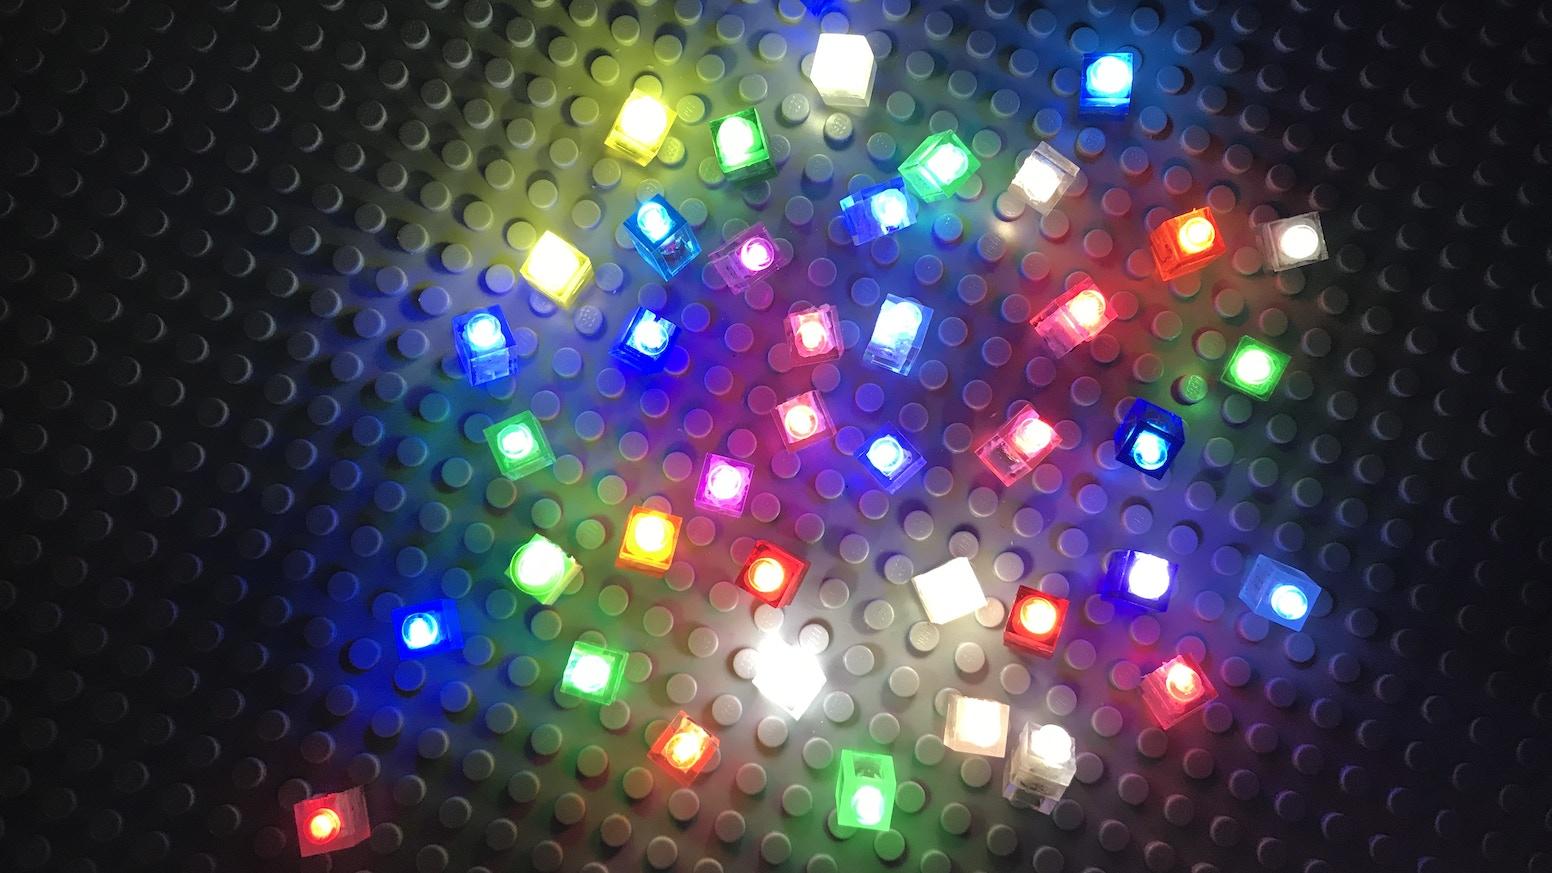 I brix wirelessly powered lighting system for lego bricks